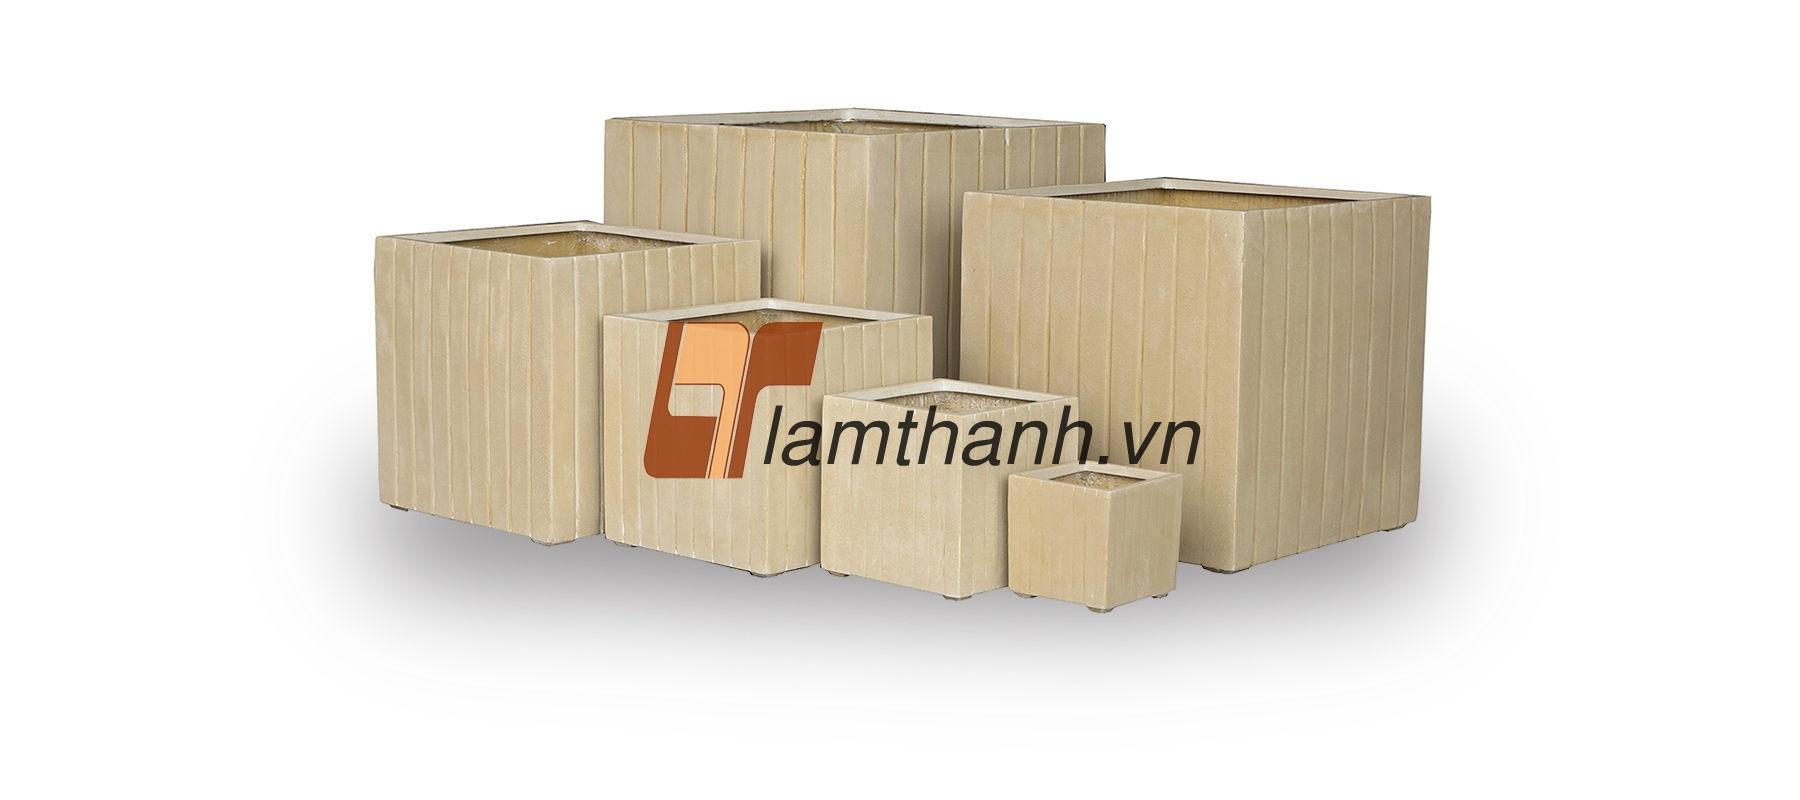 vietnam polystone, fiberstone 01